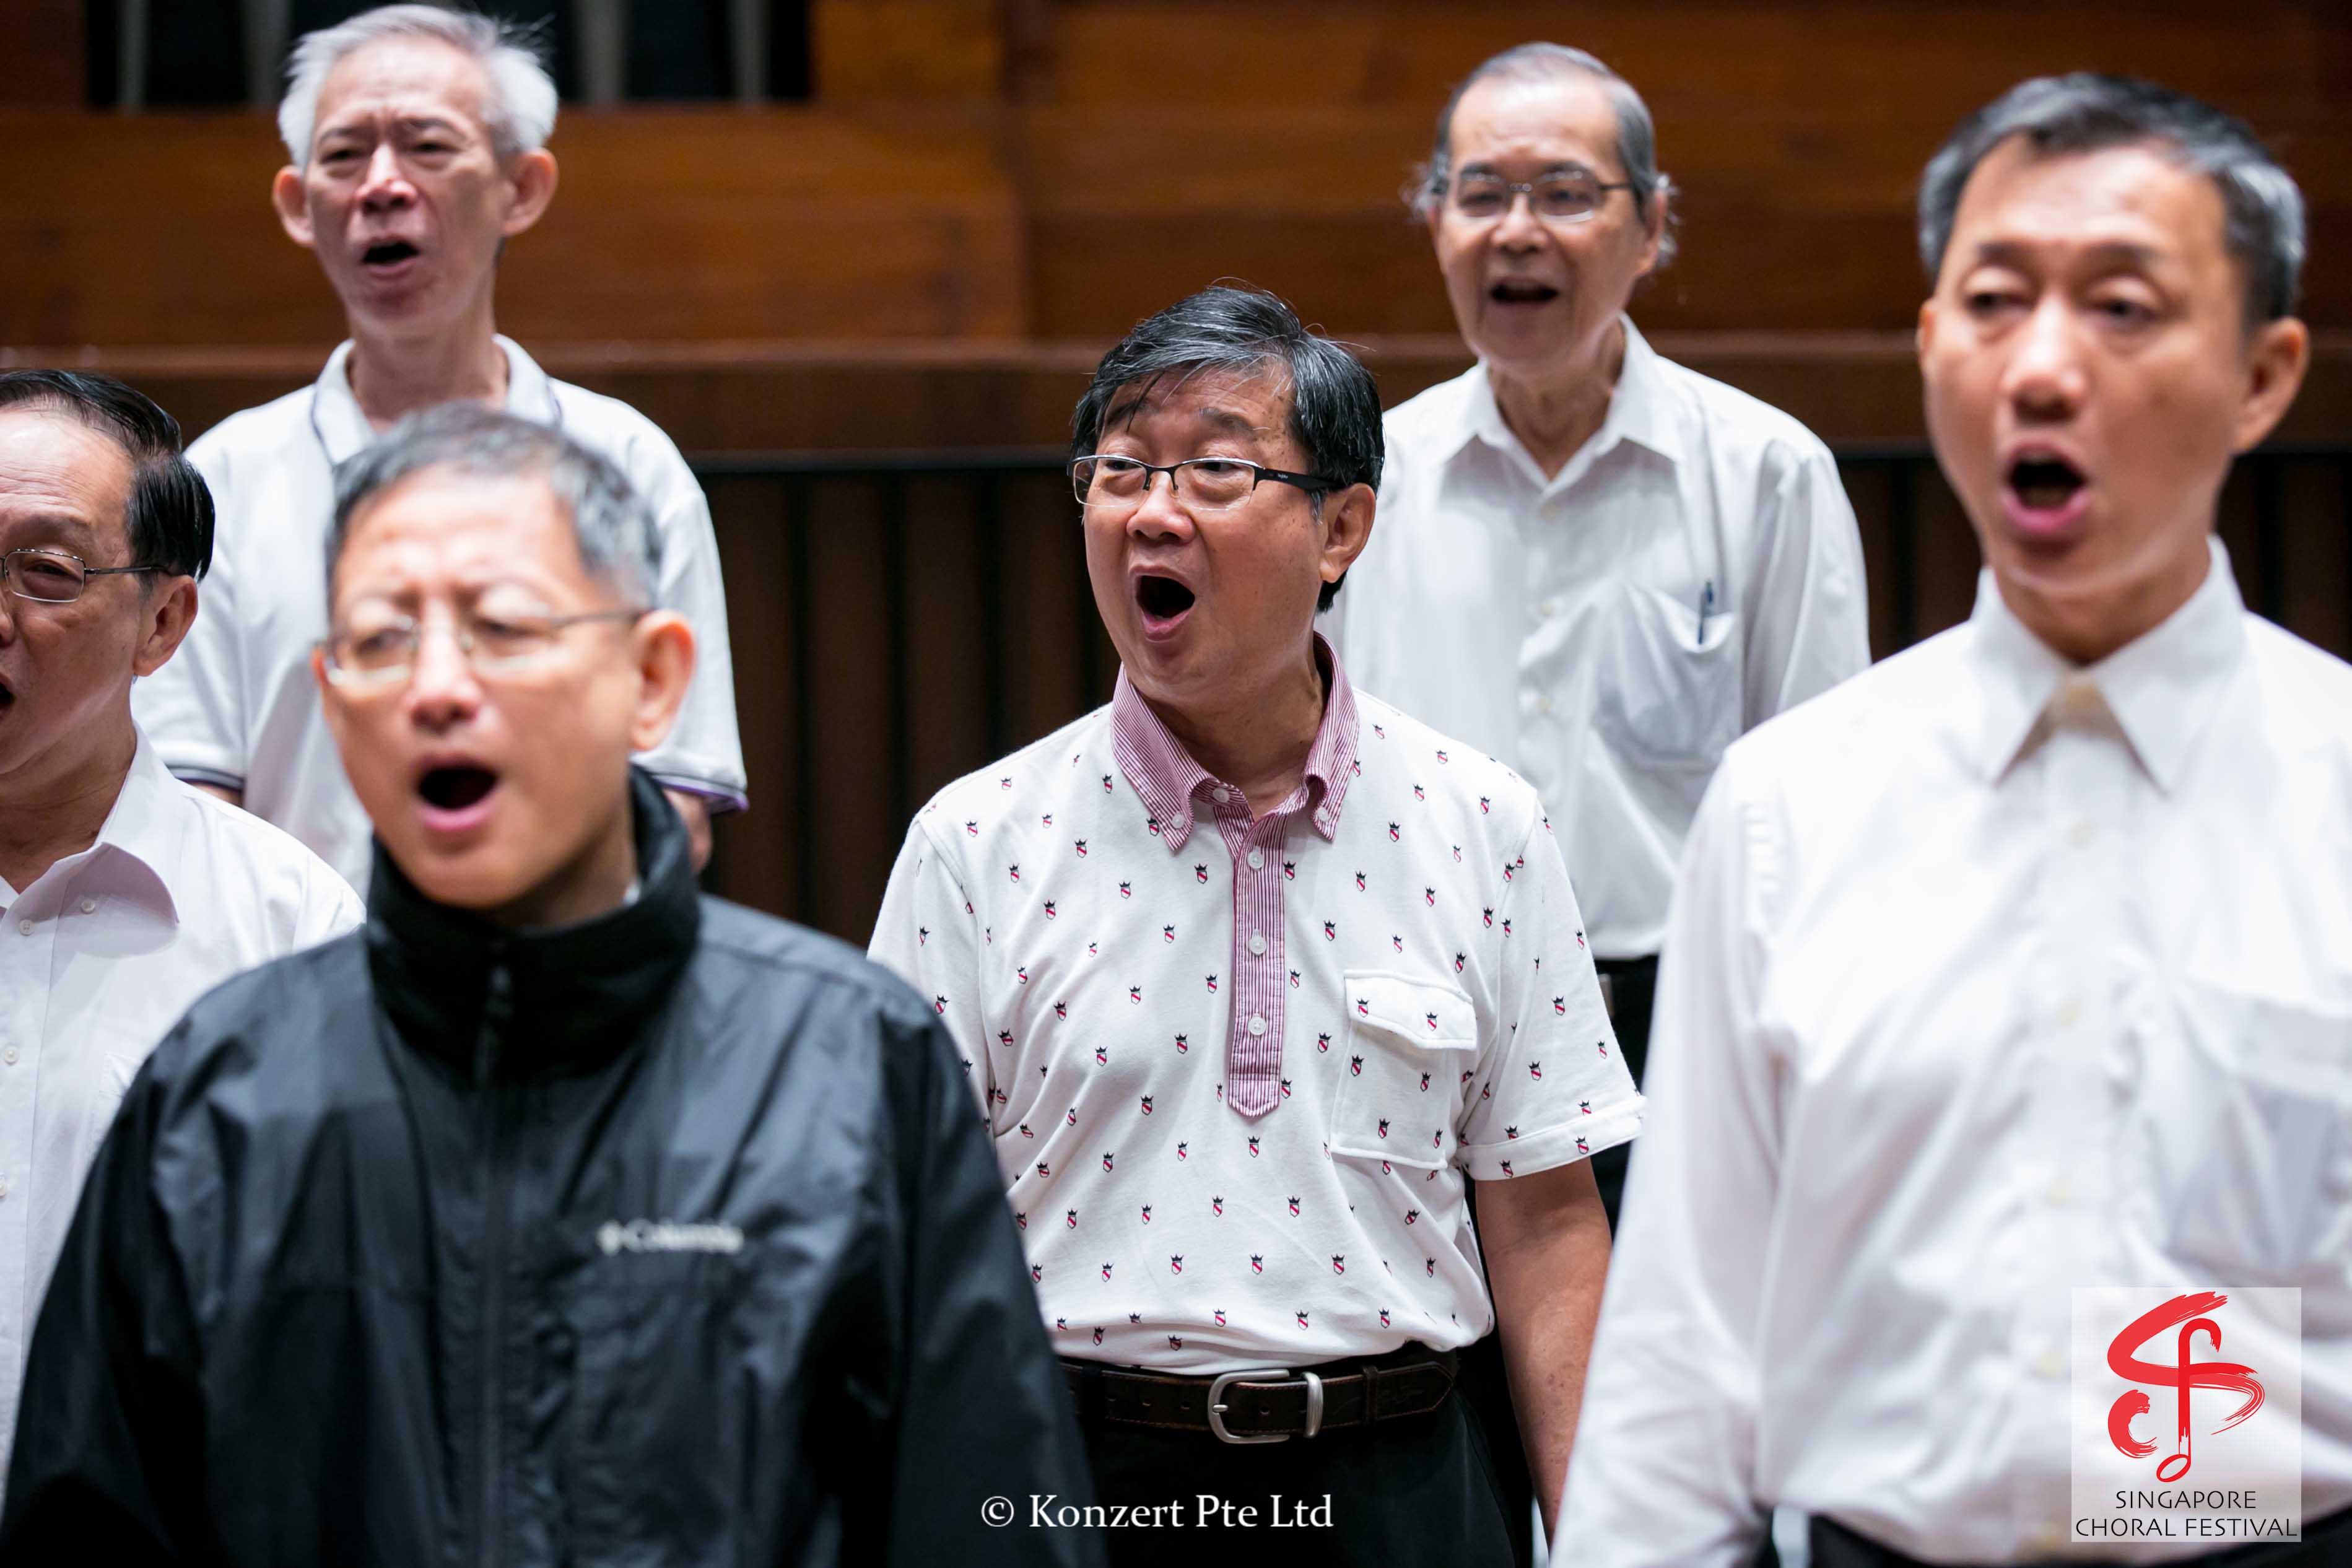 Singapore Choral Festival 8-8-15 (32).jpg